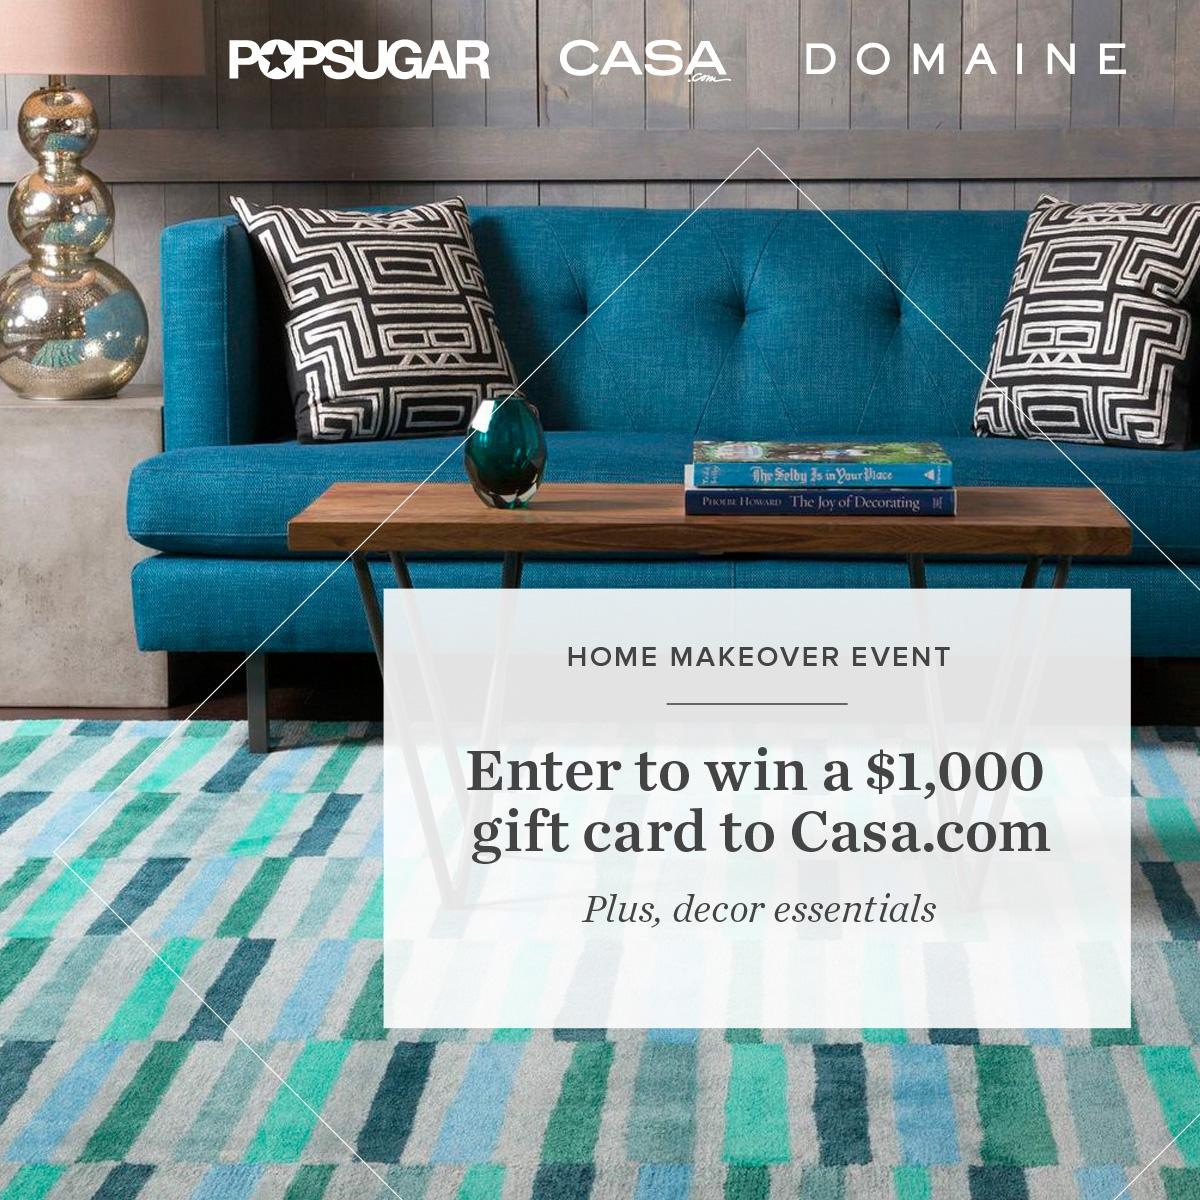 Enter on Popsugar to win a $1K gift card to http://t.co/ekANPuGzzC. Enter by Thursday, 4/2: http://t.co/dK1DukMfLr http://t.co/uA4HHUlRGO